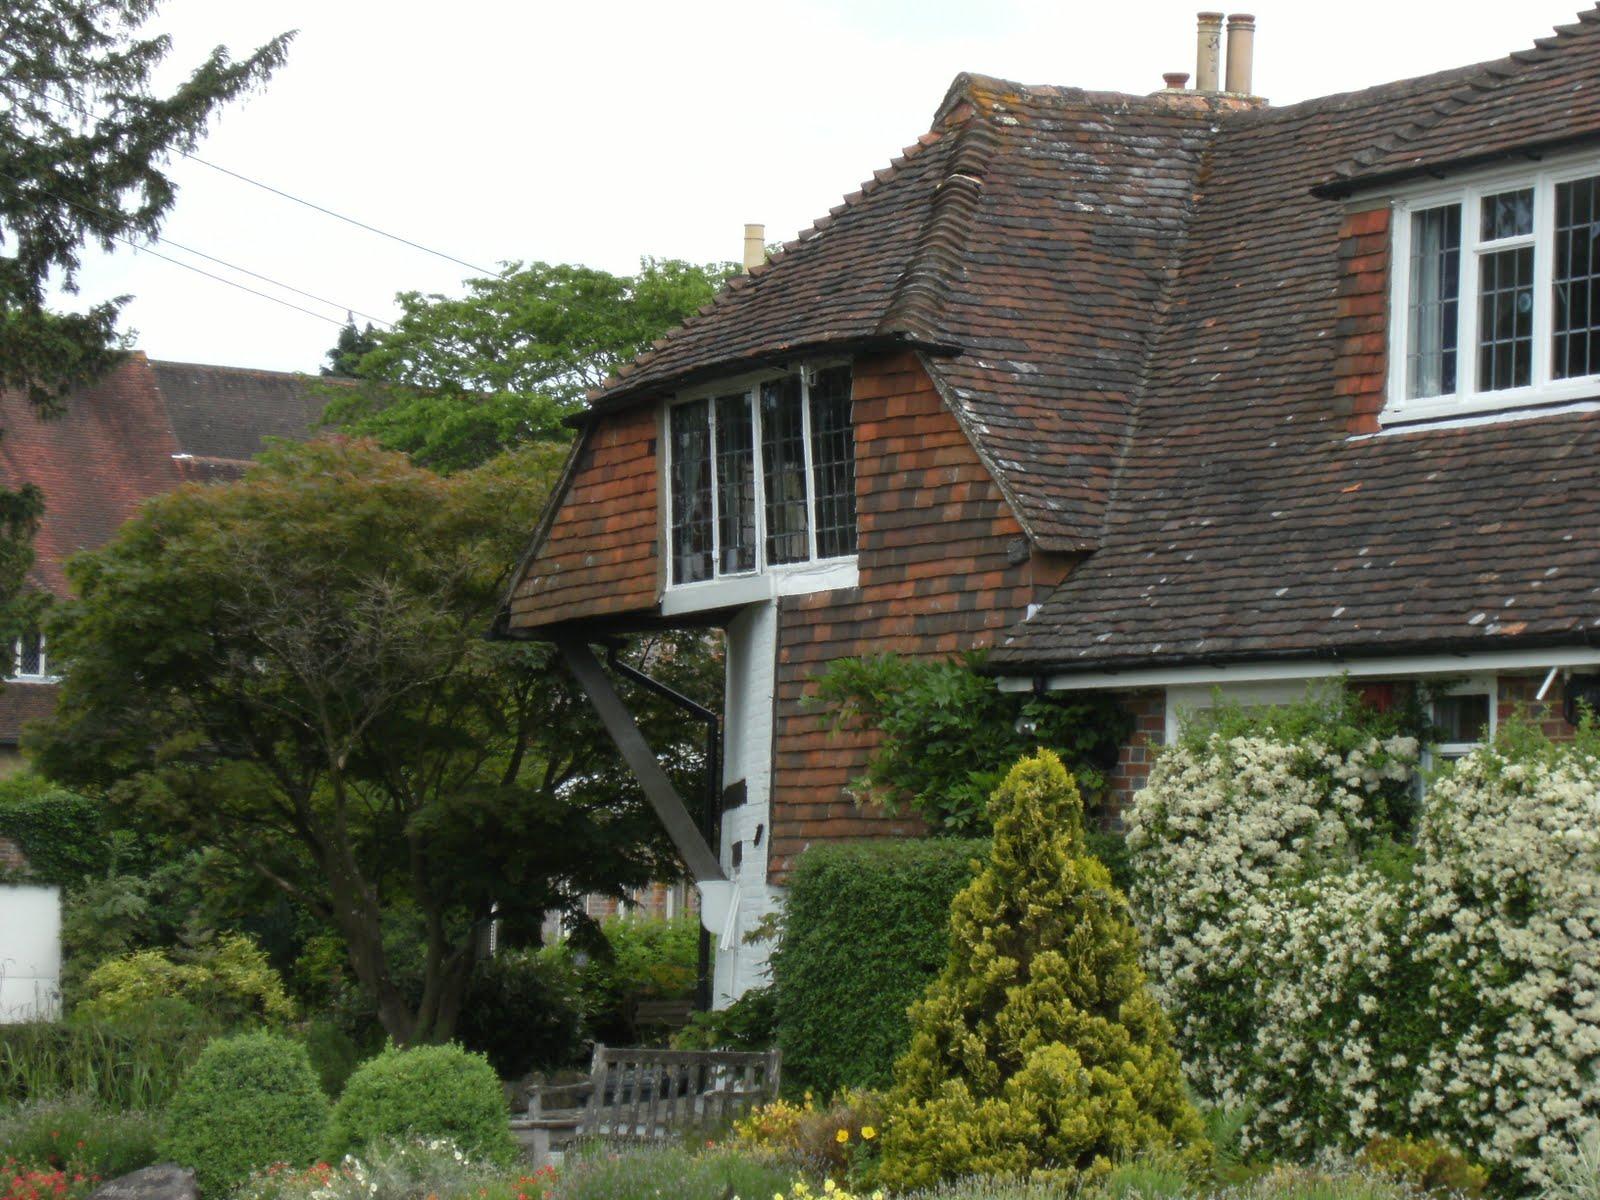 1006120037 Monk's House, Withyham